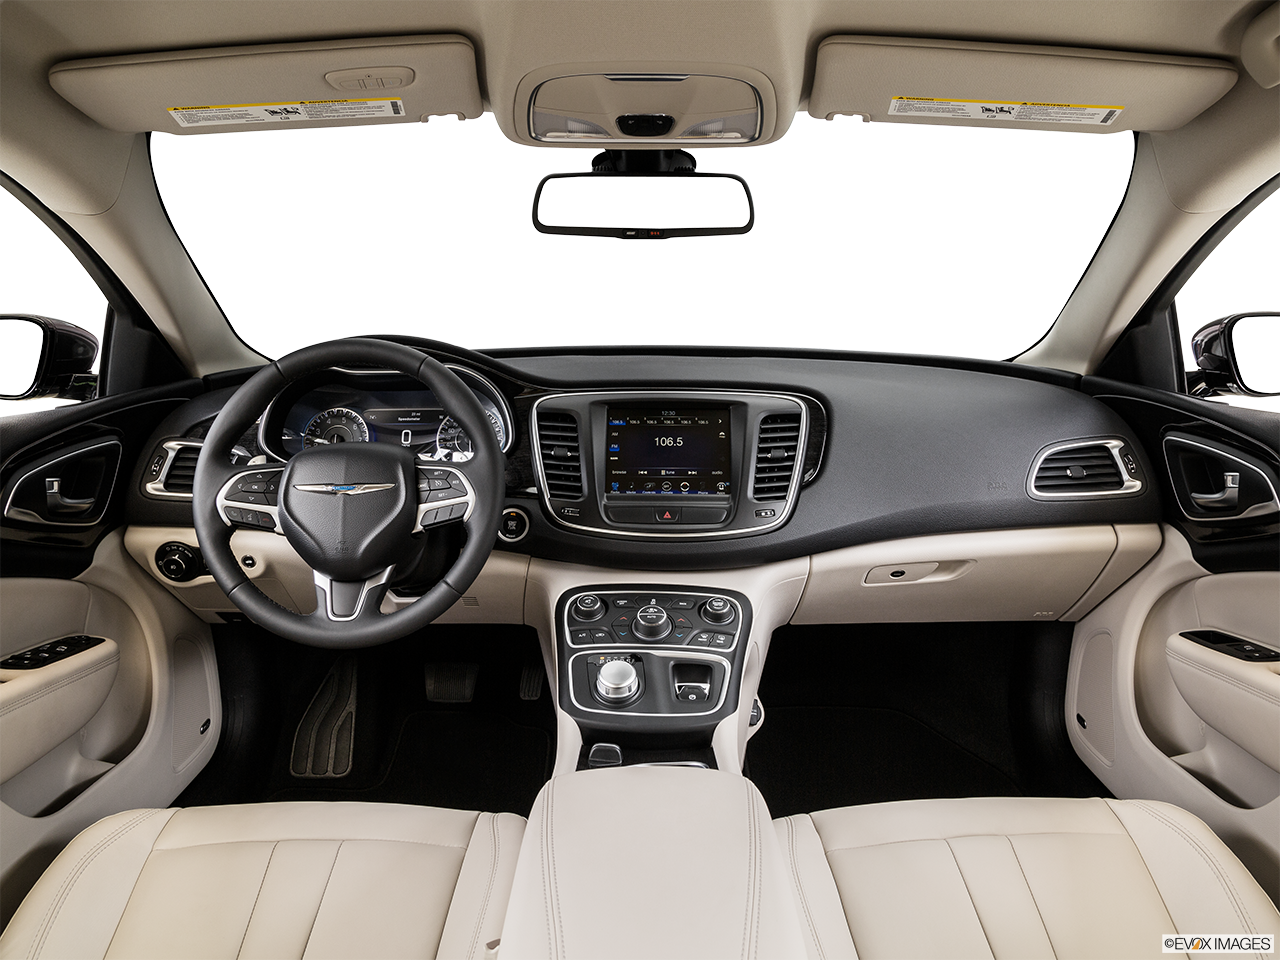 Interior View Of 2015 Chrysler 200 in Huntington Beach